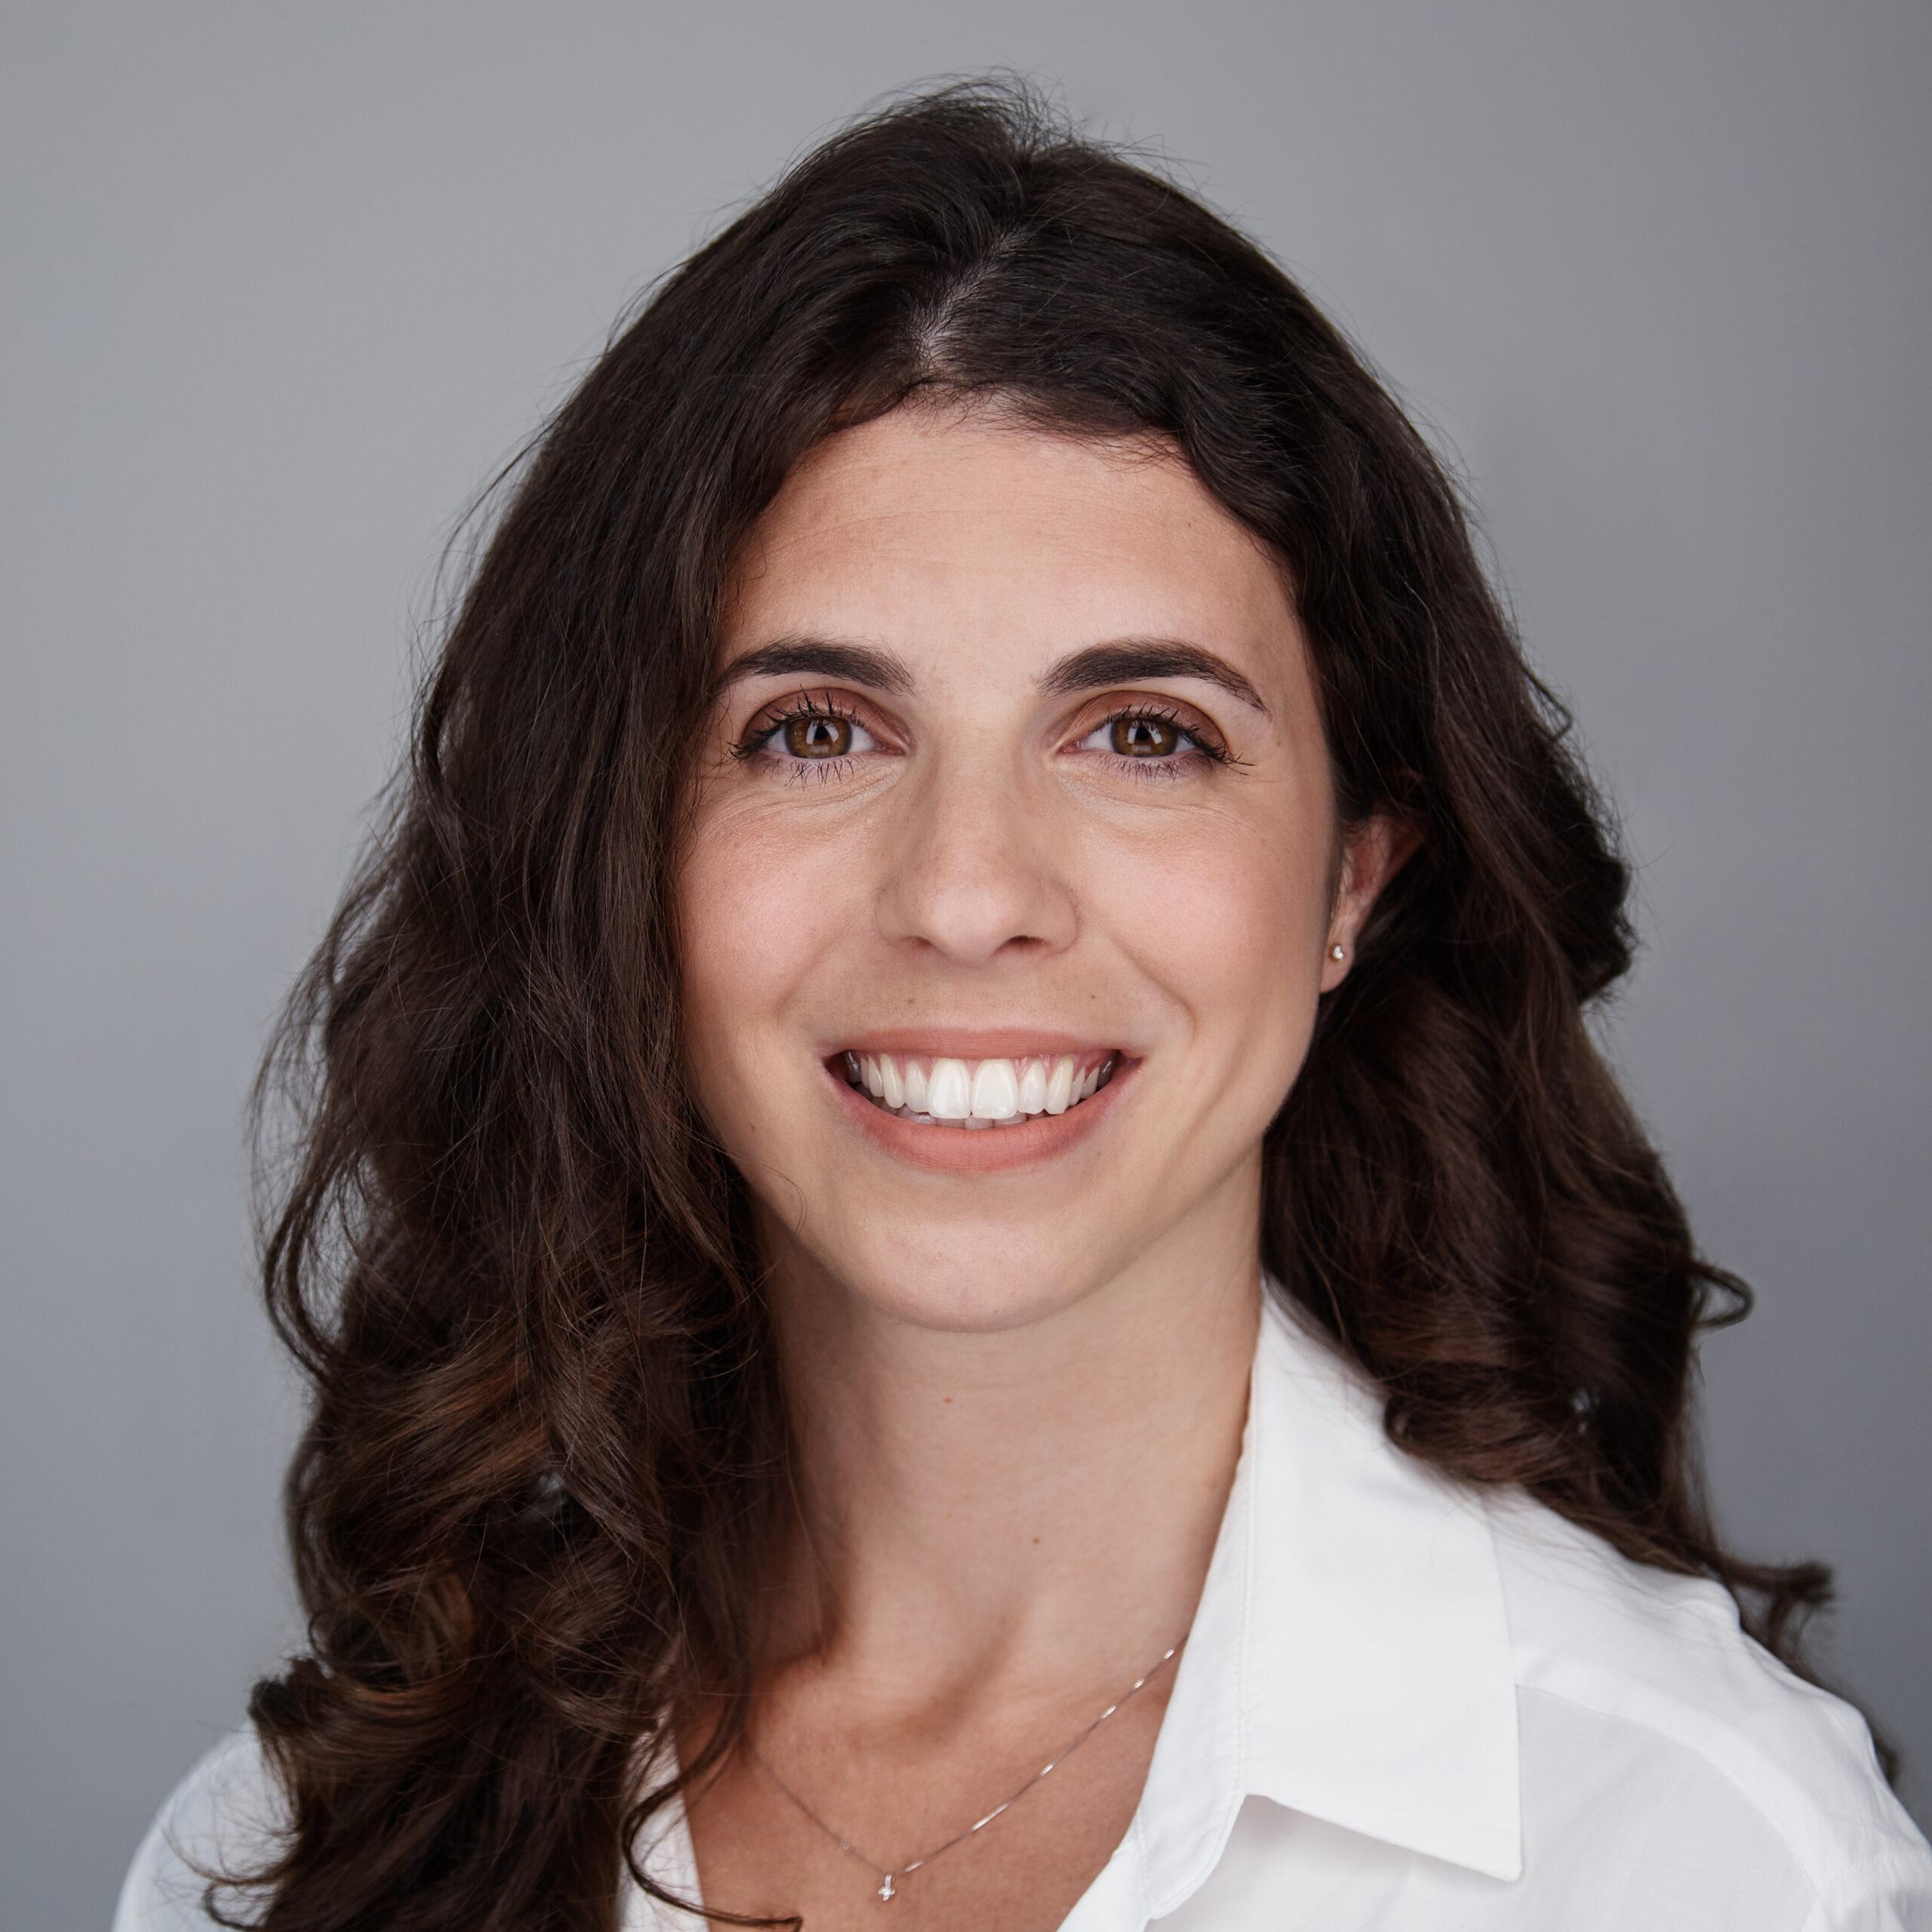 Sonia Difrancesco